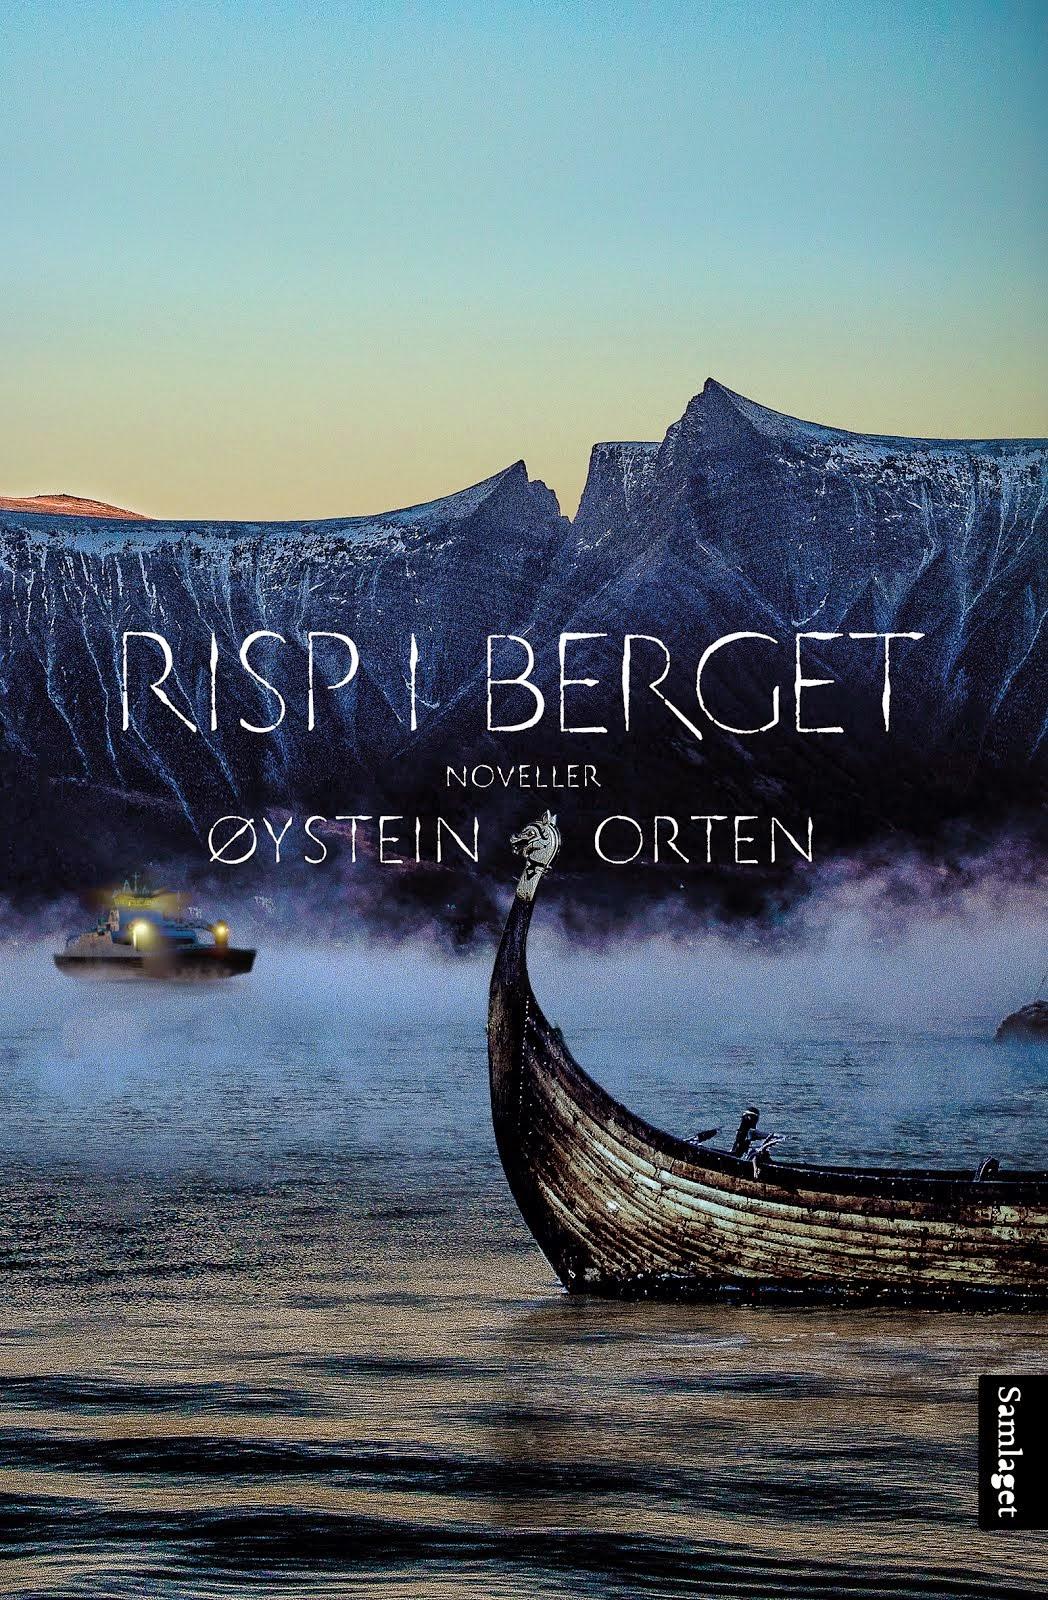 RISP I BERGET (2015)